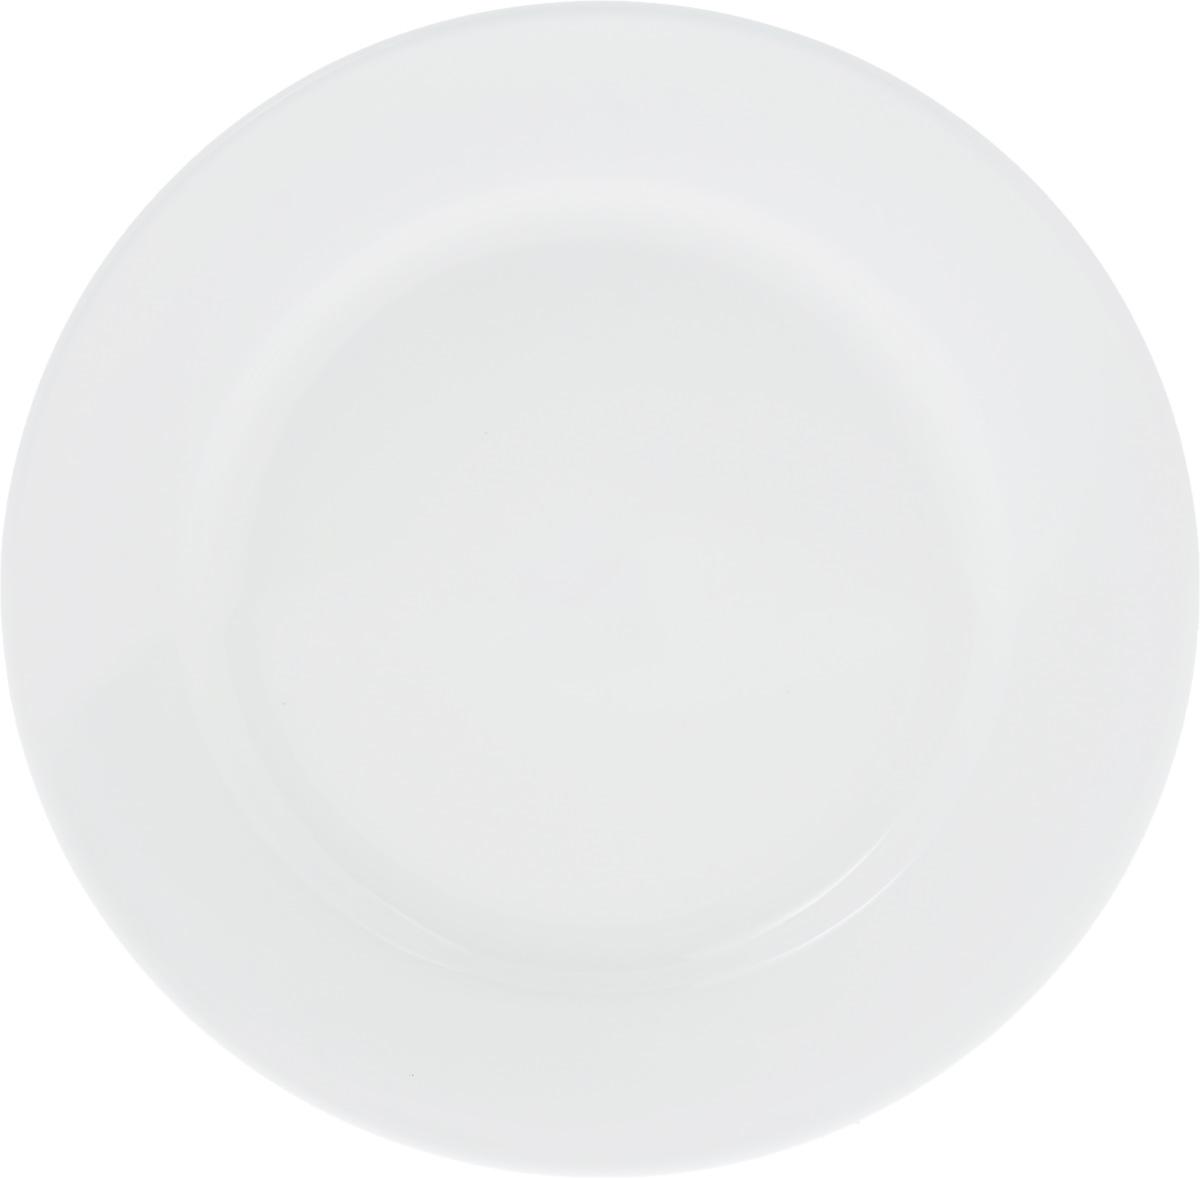 Тарелка Wilmax, диаметр 18 см. WL-991177 / A